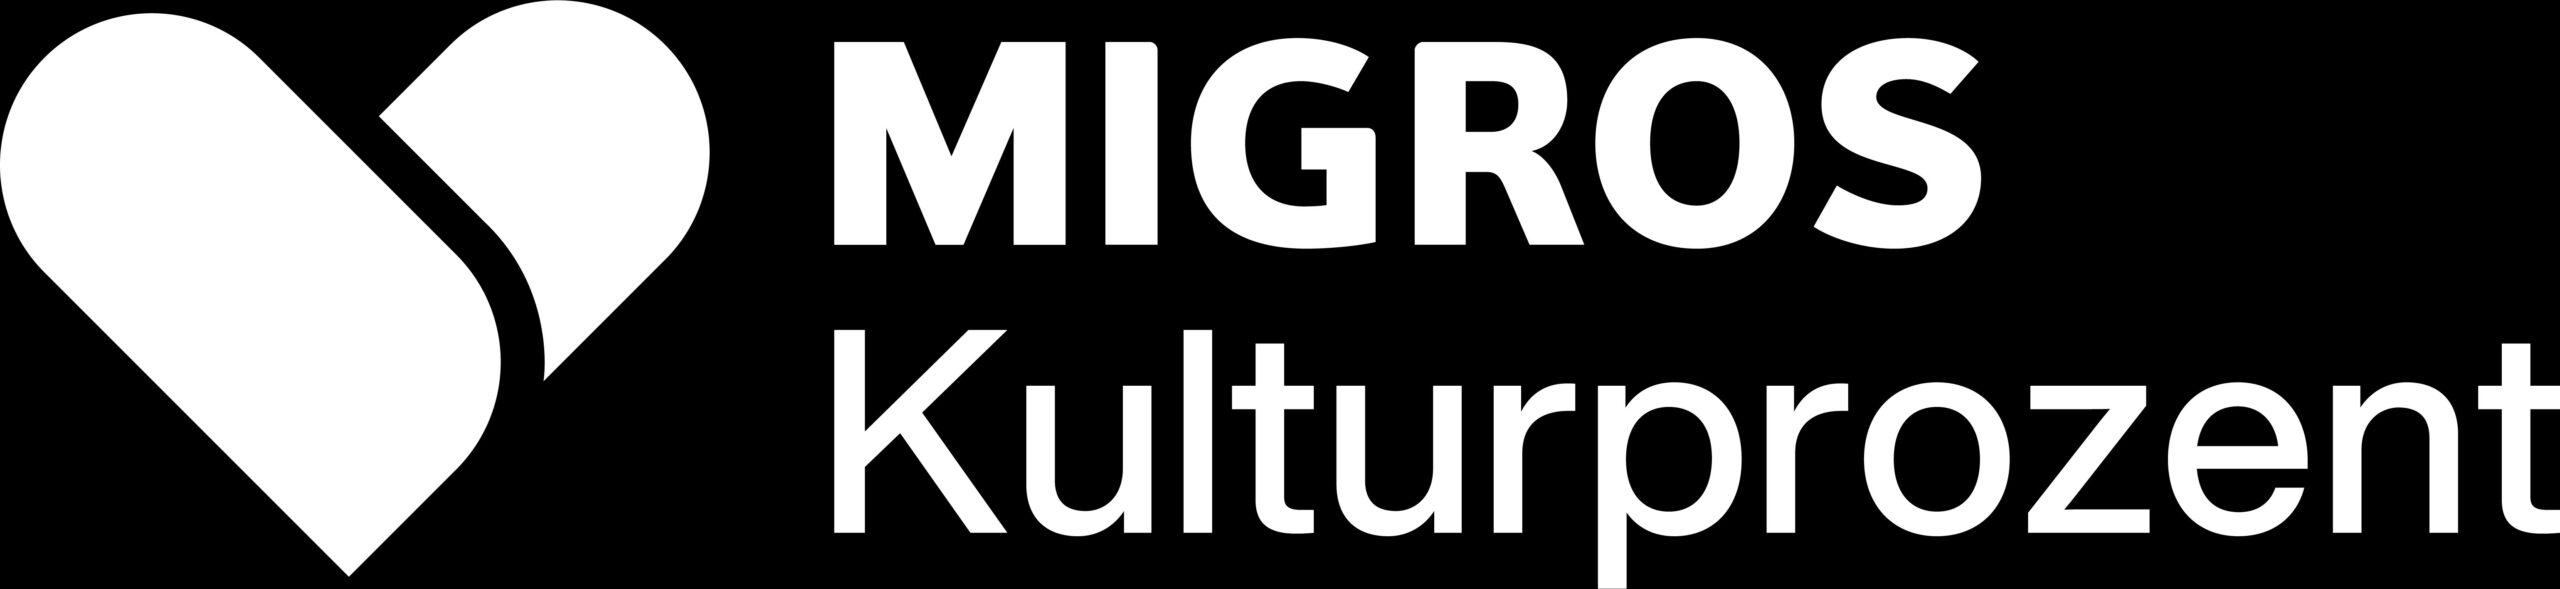 Migros Kulturprozent_Logo_FGE_MK_sw_300dpi_DE